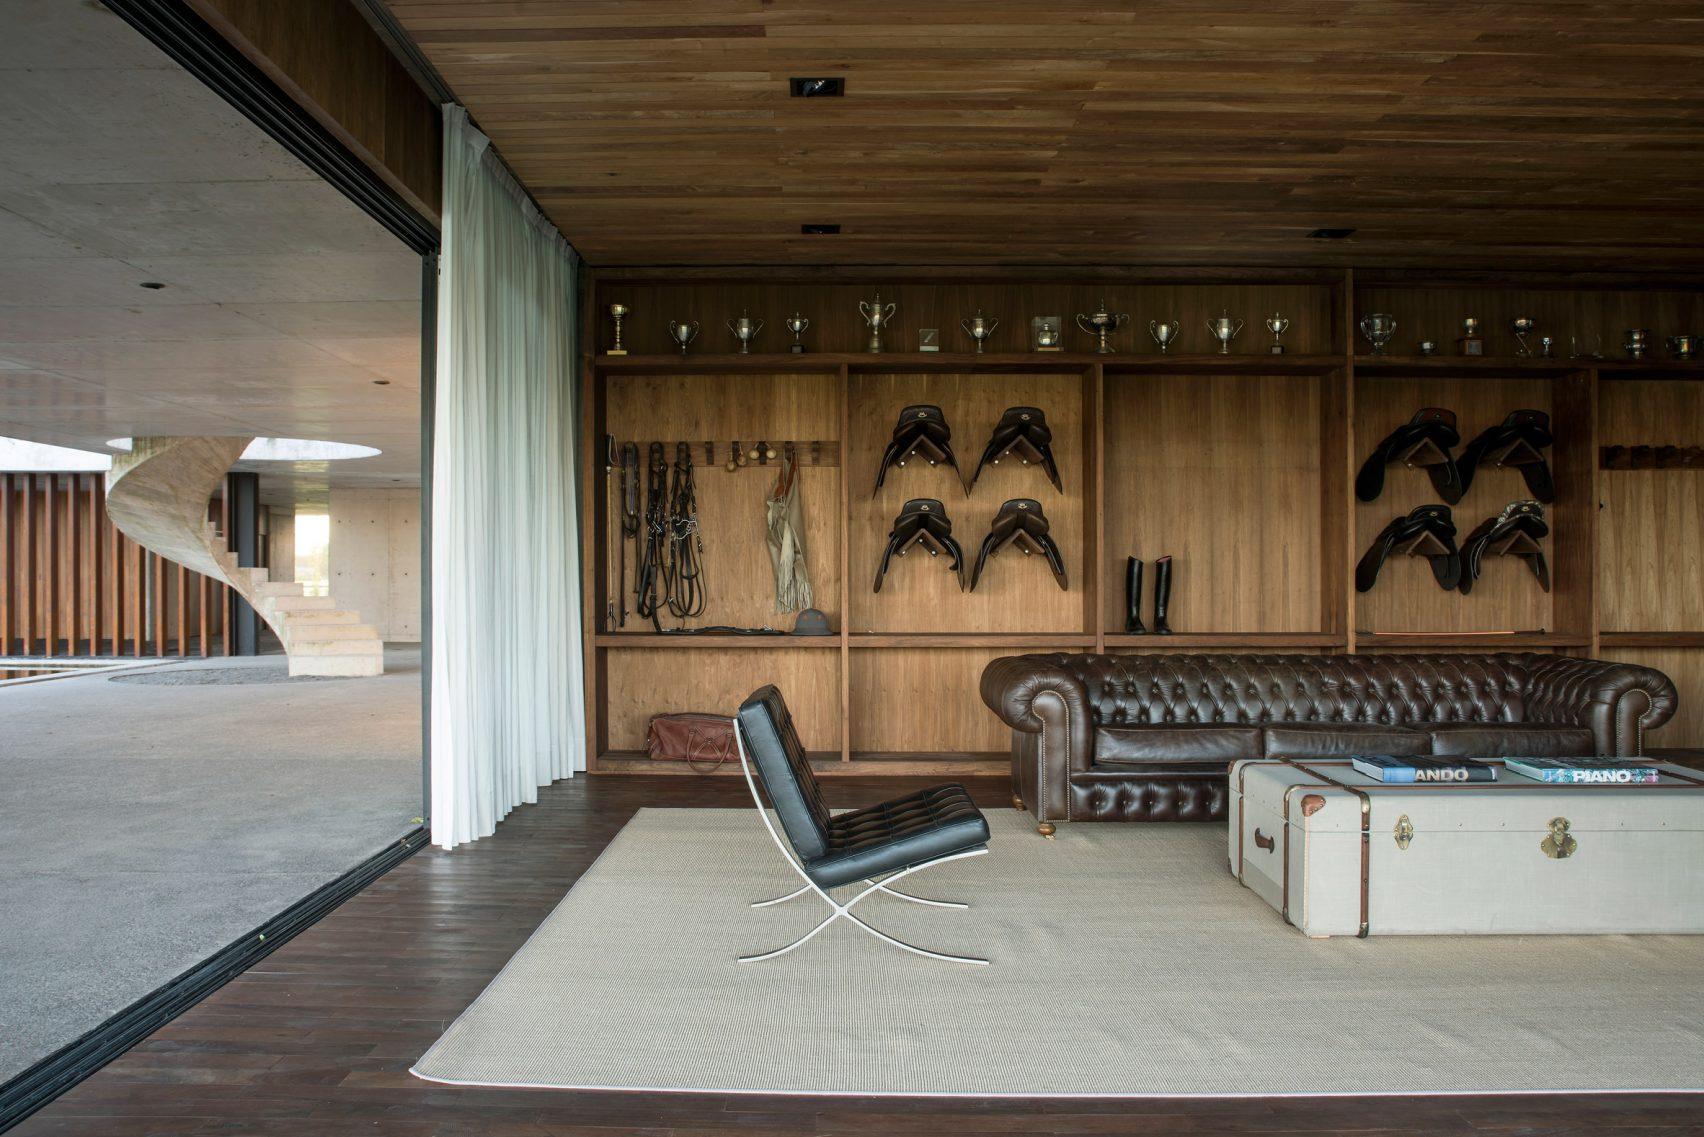 figueras-polo-stables-estudio-ramos-architecture-public-and-leisure_dezeen_2364_col_24-1704x1137.jpg